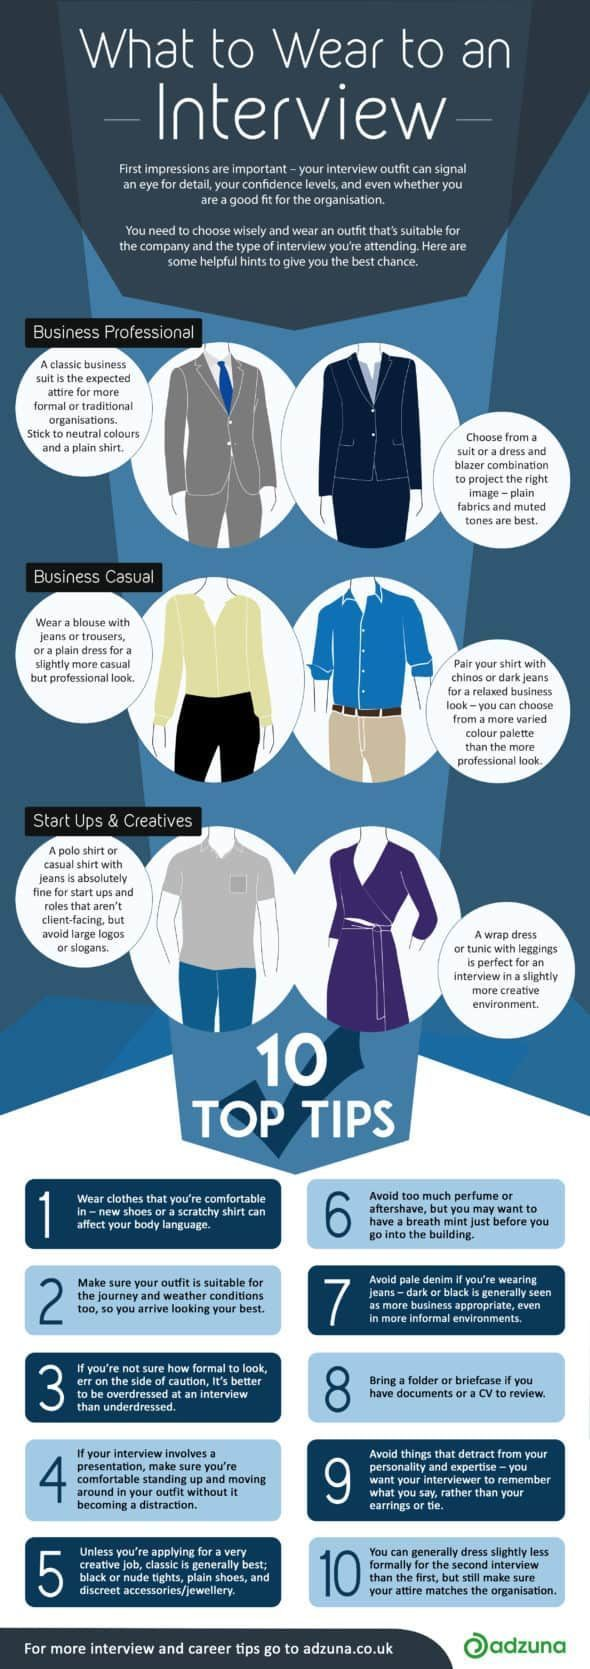 Työhaastattelu Vaatteet